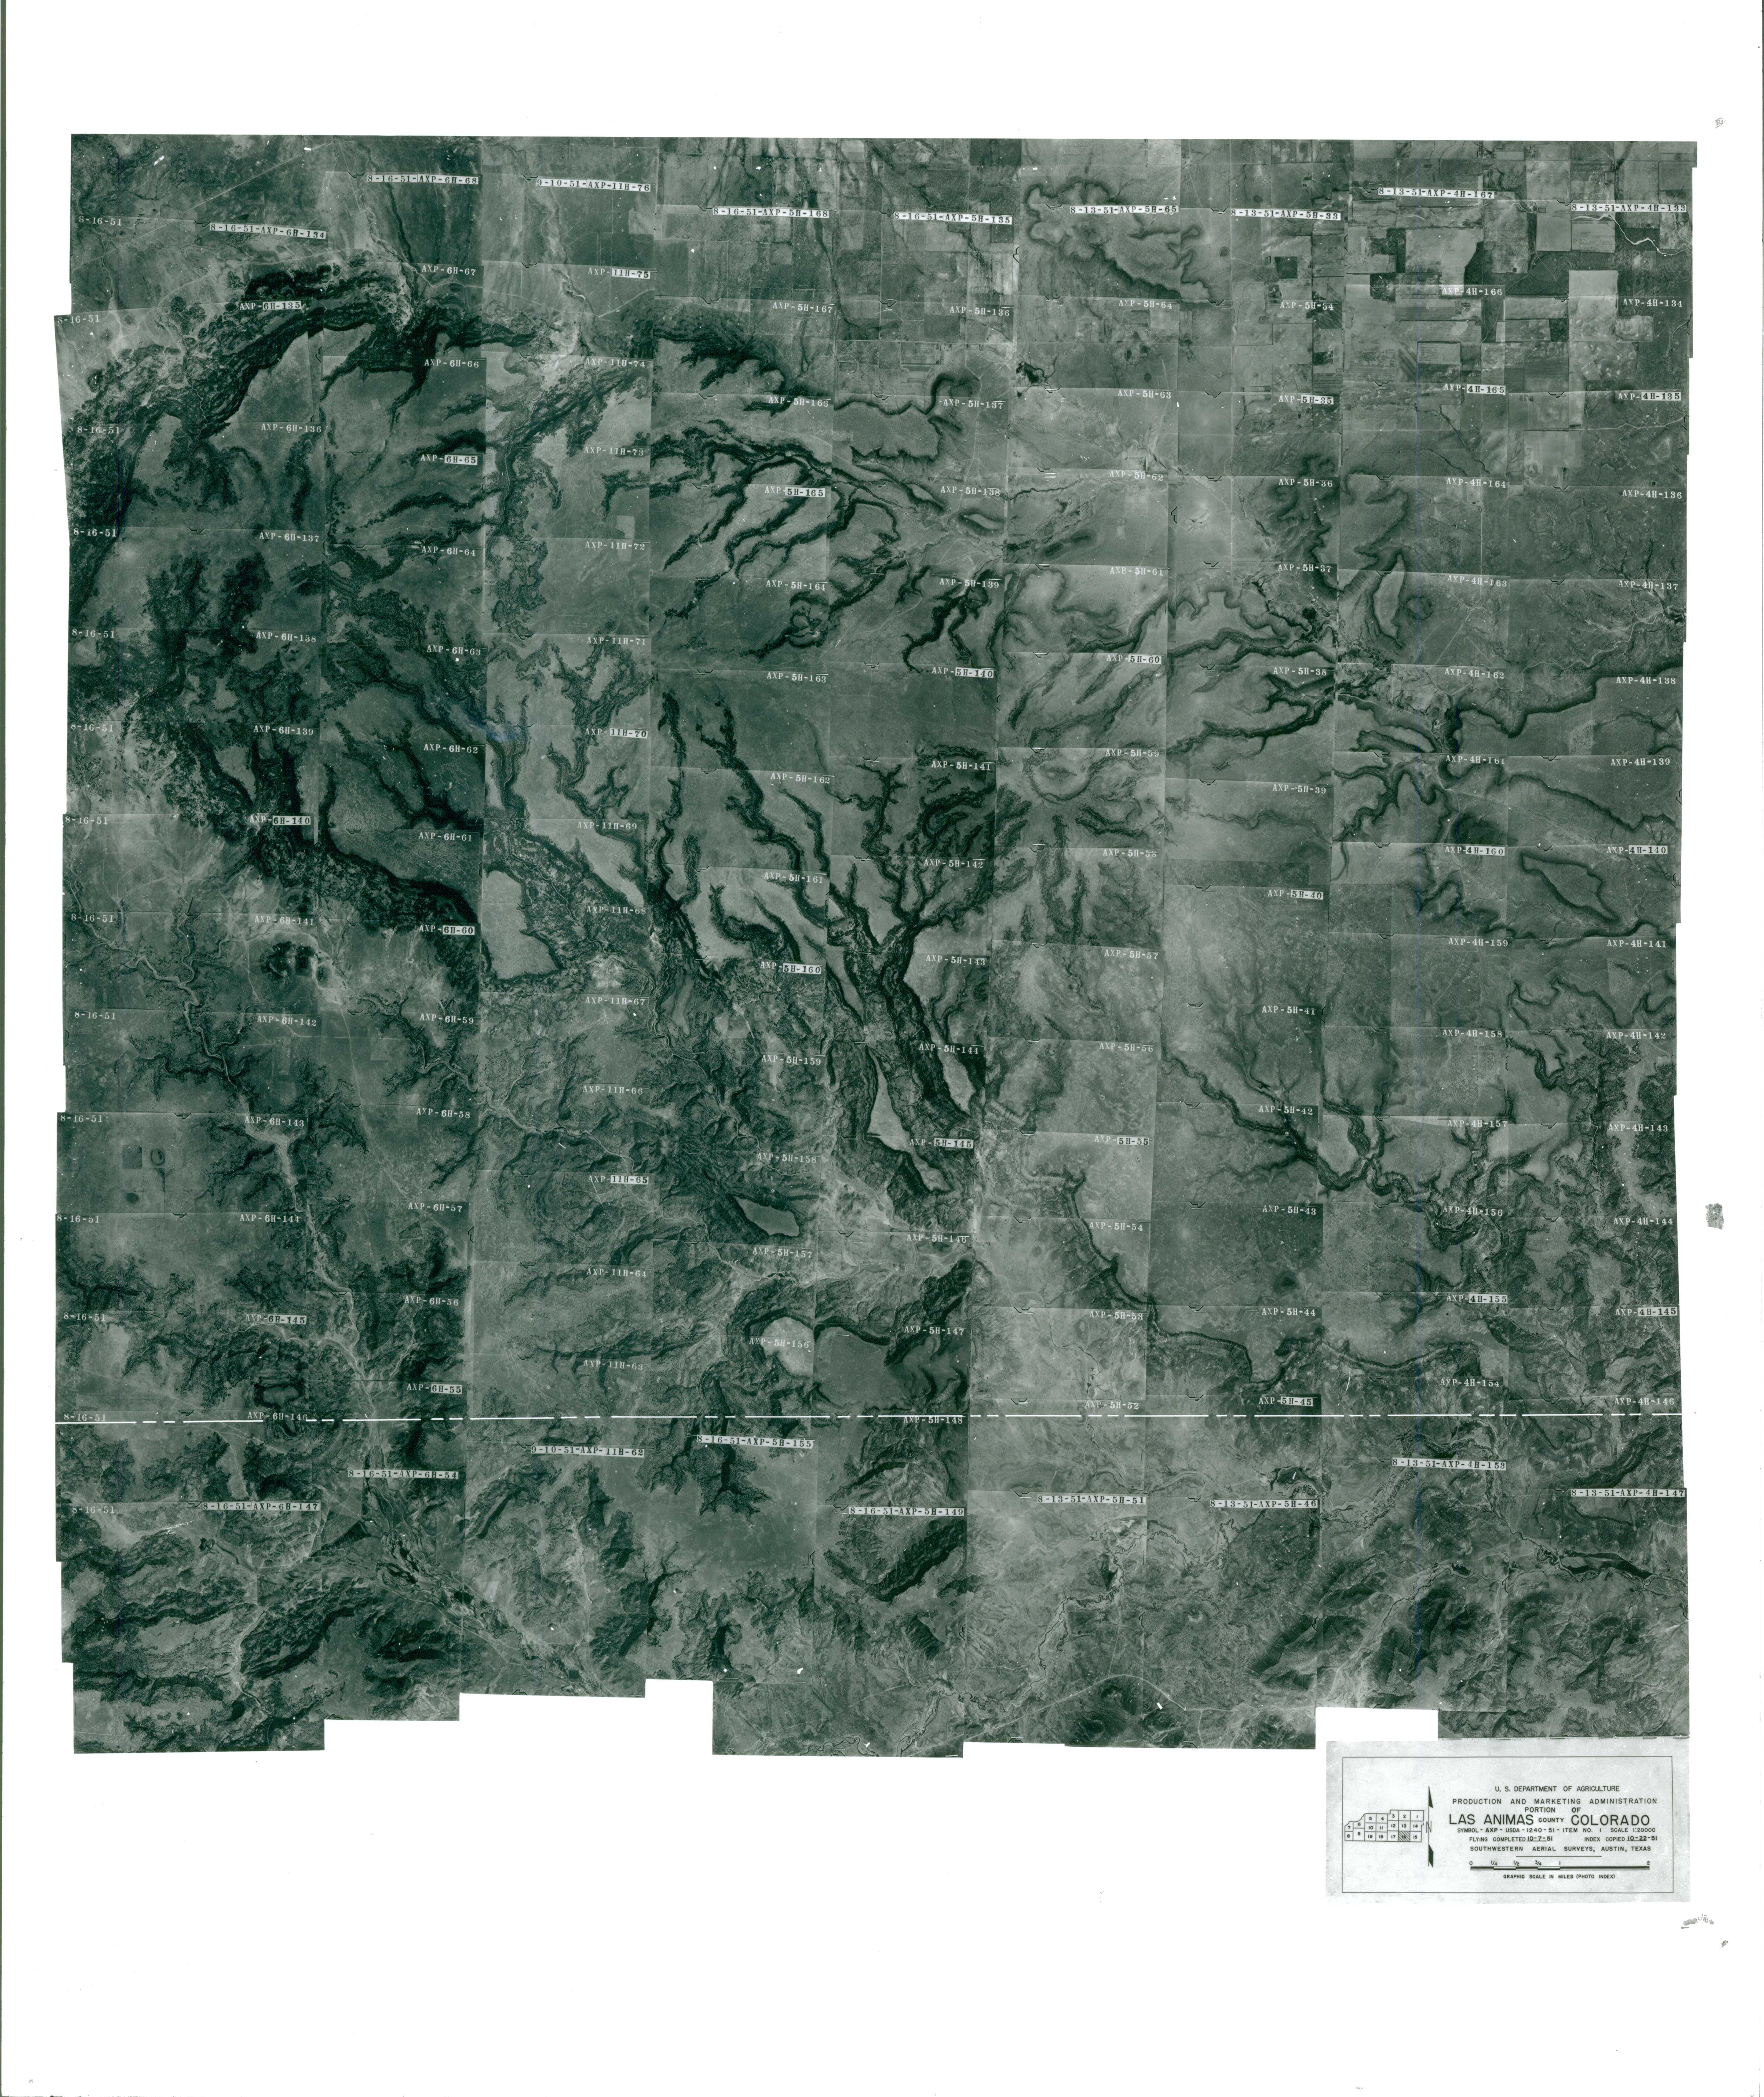 Aerial Photography Index for Las Animas County, Colorado, Sheet 16